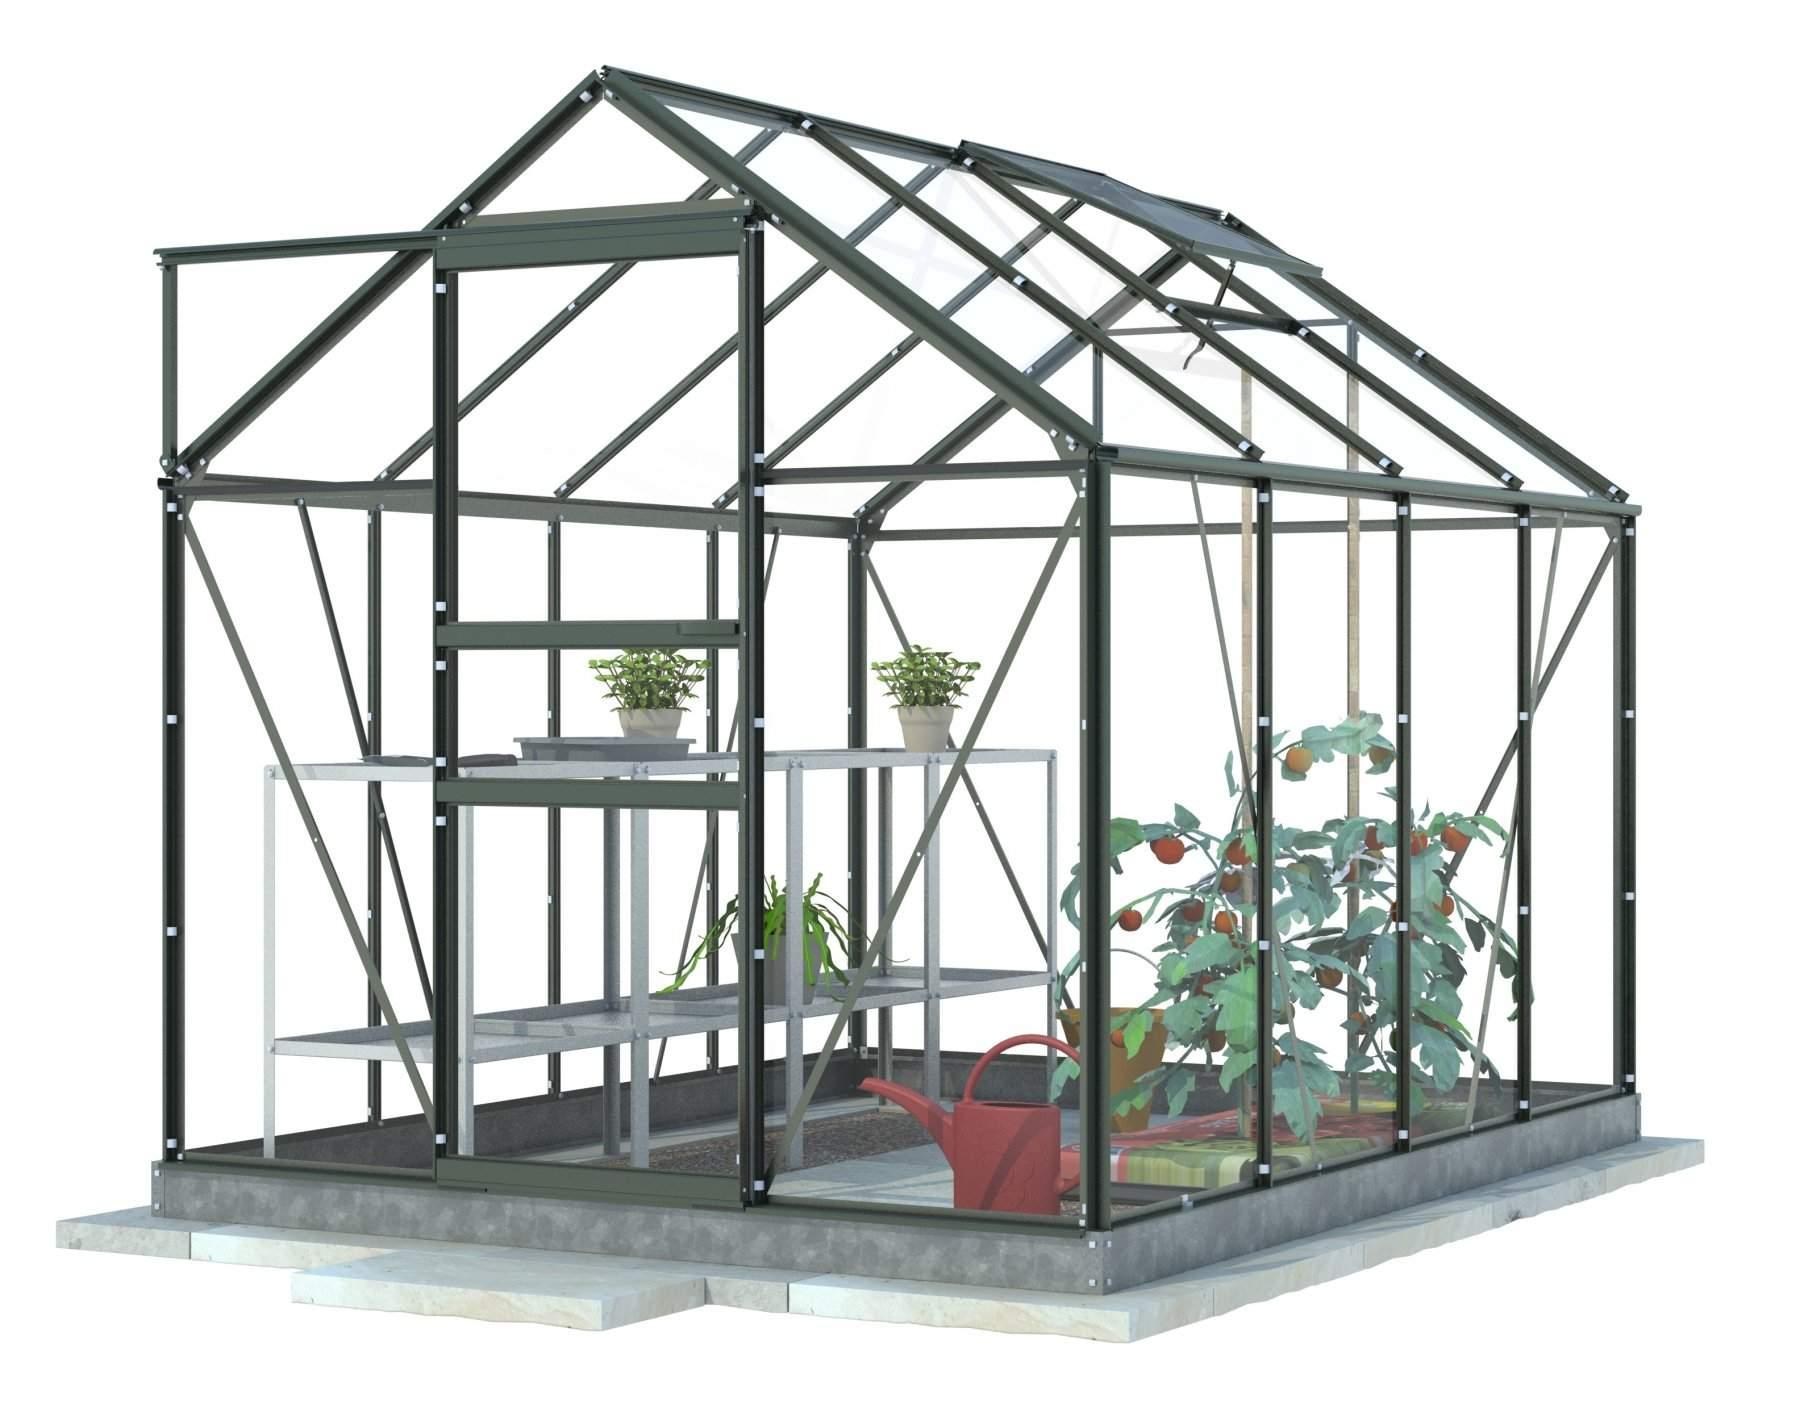 Greenhouse 2-Tier Plant Propagator Green SALE £6.00